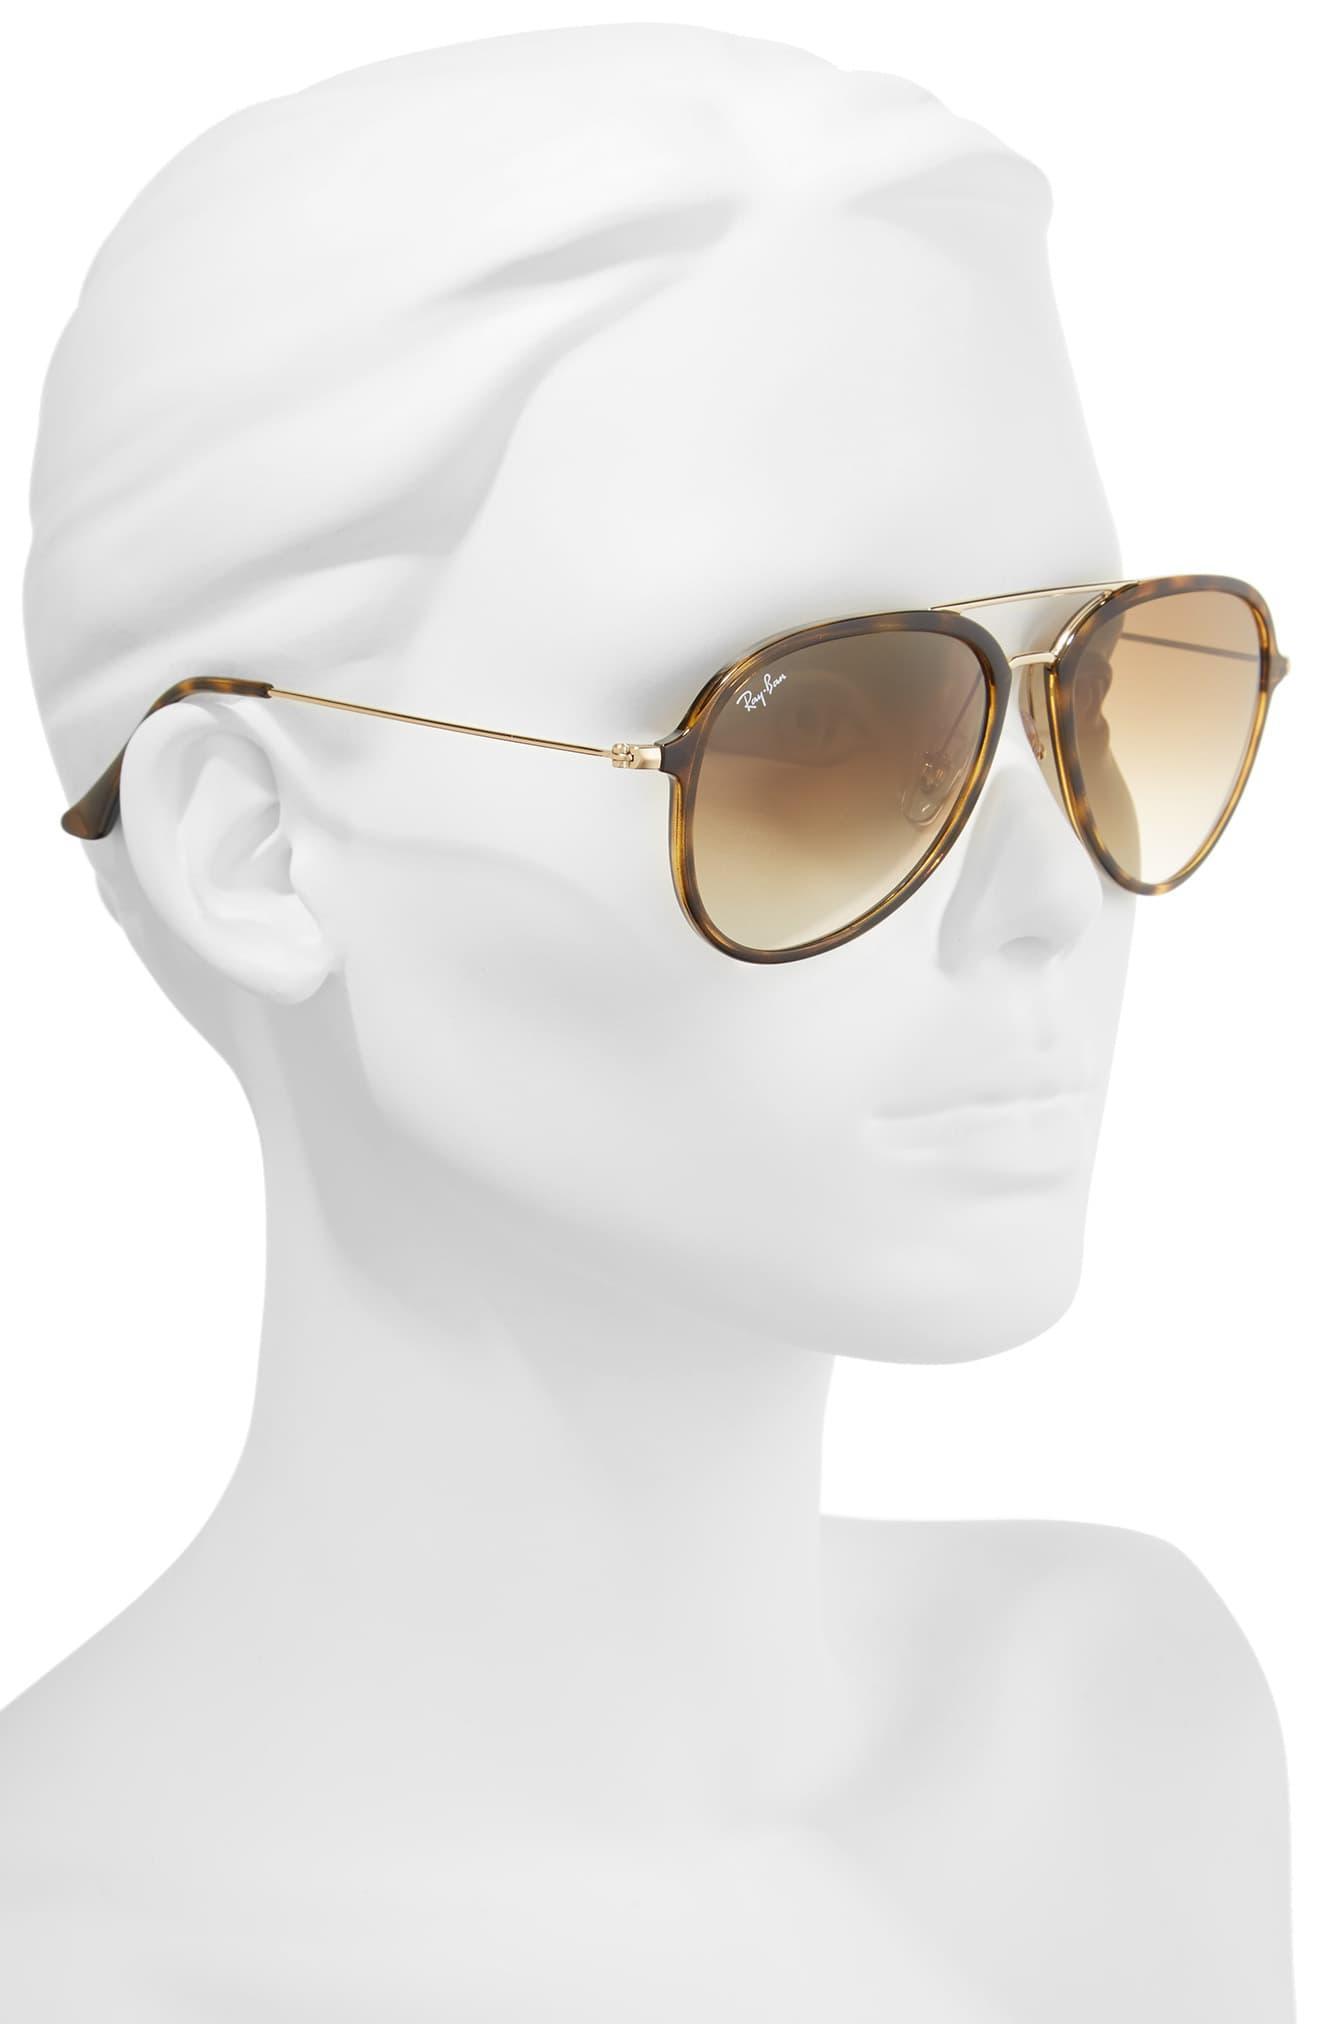 125630ecee09a Ray-Ban - Multicolor 57mm Pilot Sunglasses - Light Havana - Lyst. View  fullscreen